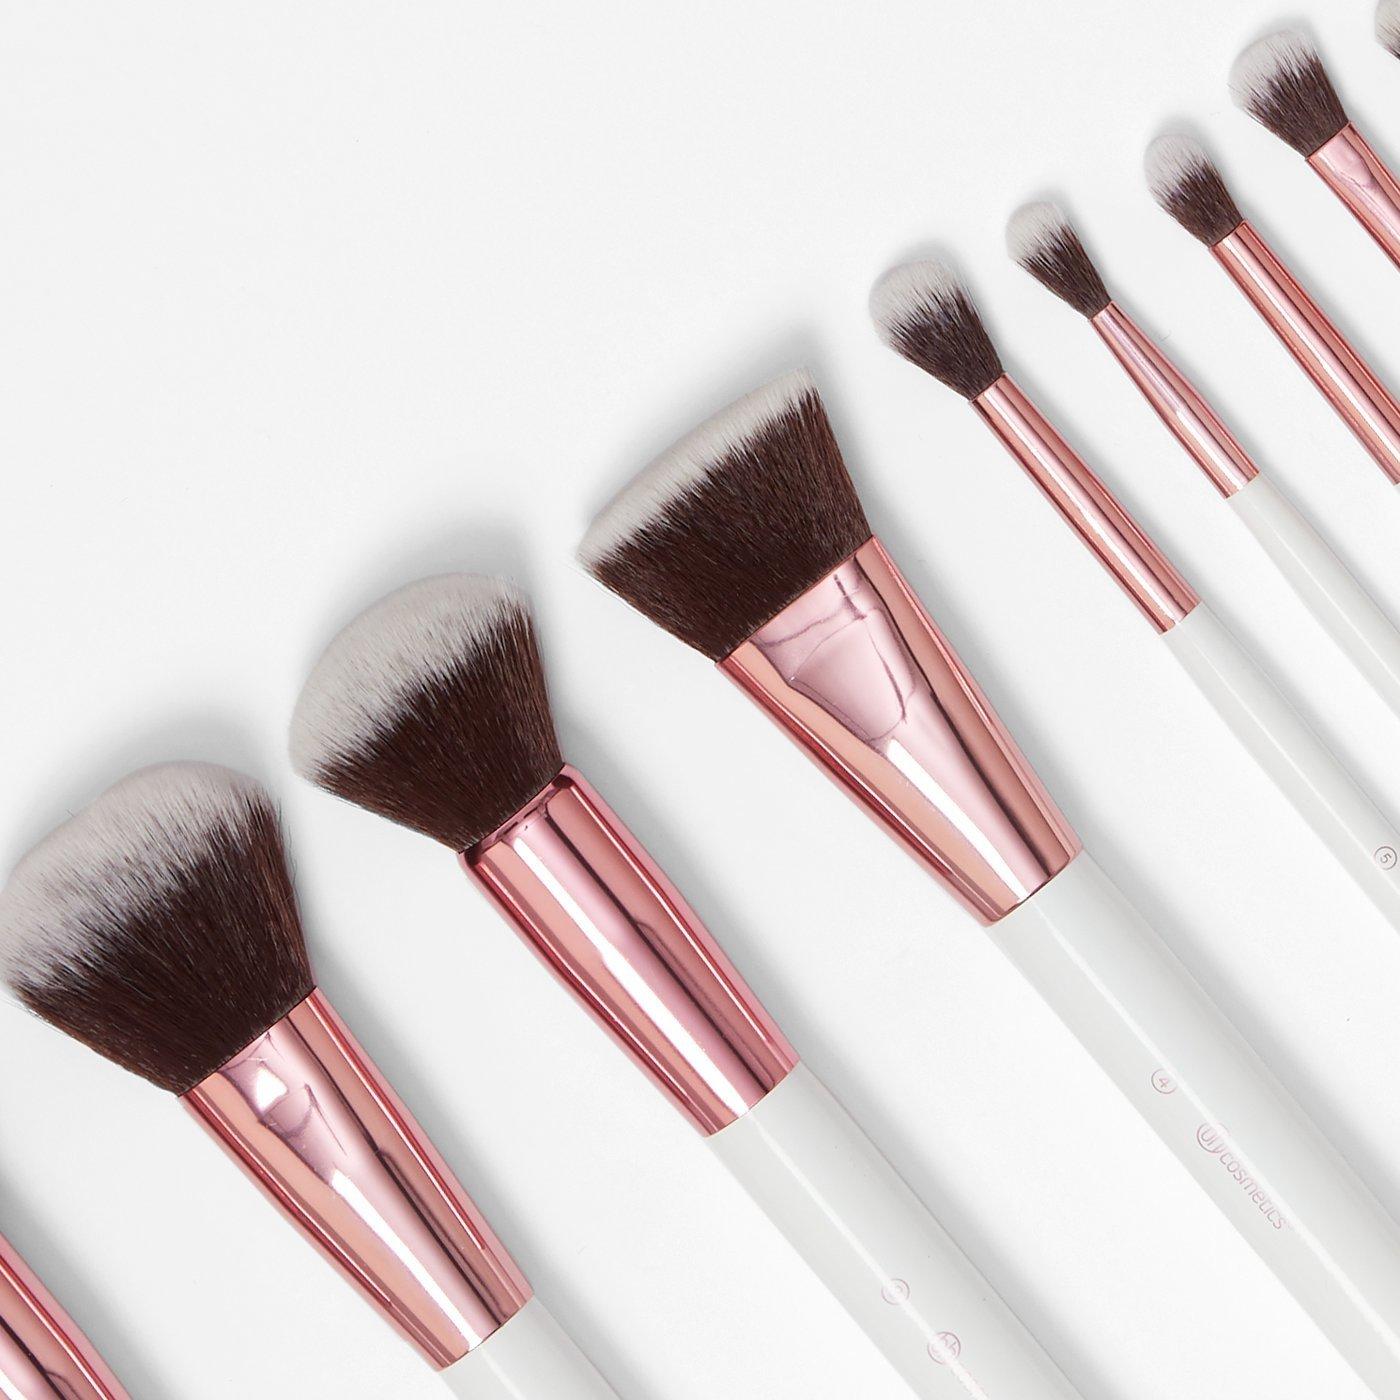 BH Cosmetics Crystal Quartz 12 piece brush set